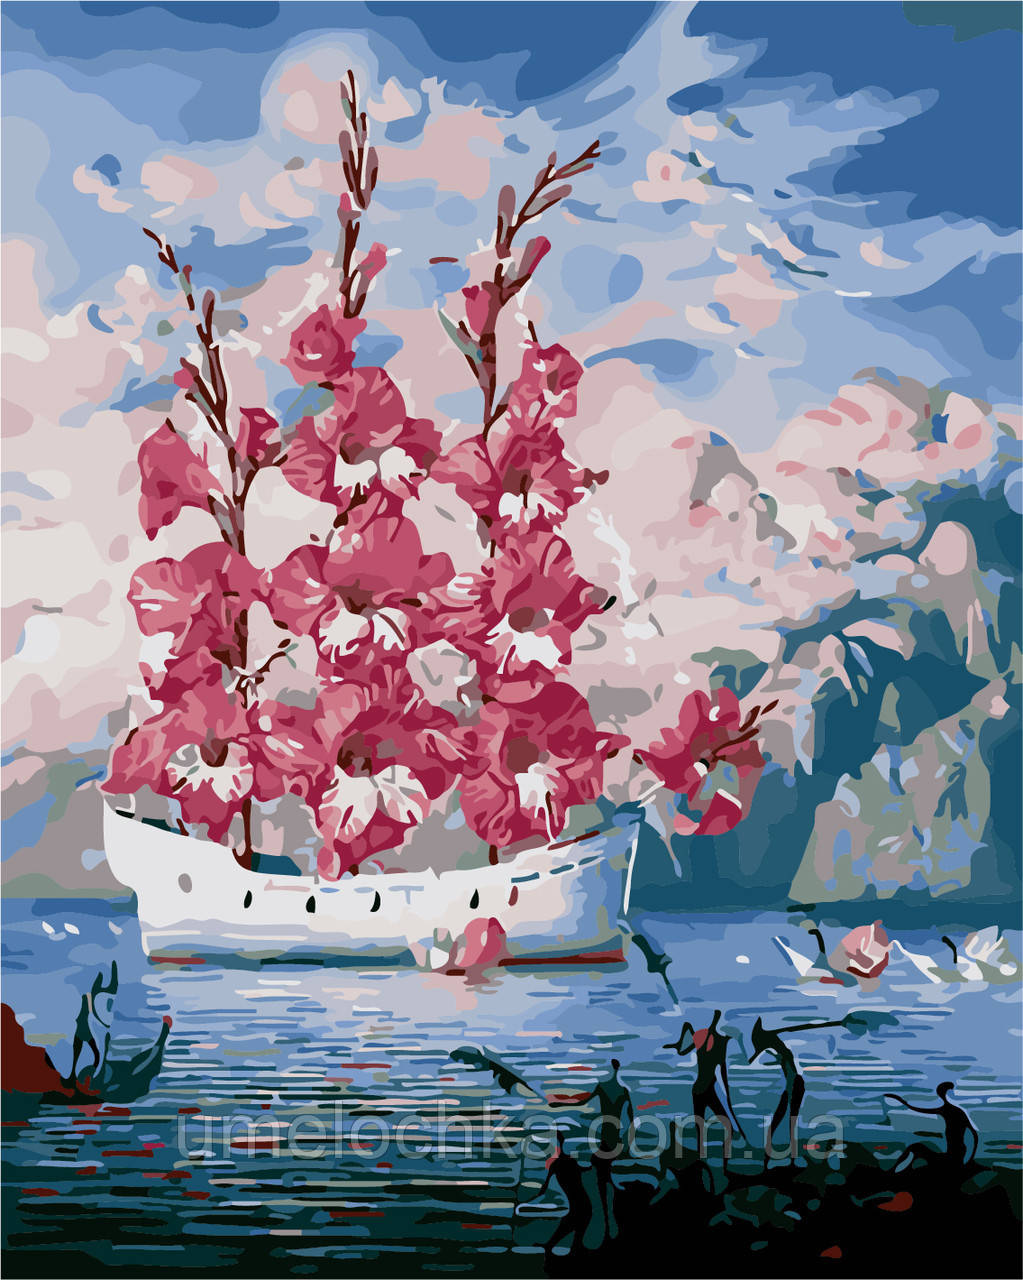 Раскраска для взрослых Цветочные паруса (AS0154) 40 х 50 см ArtStory